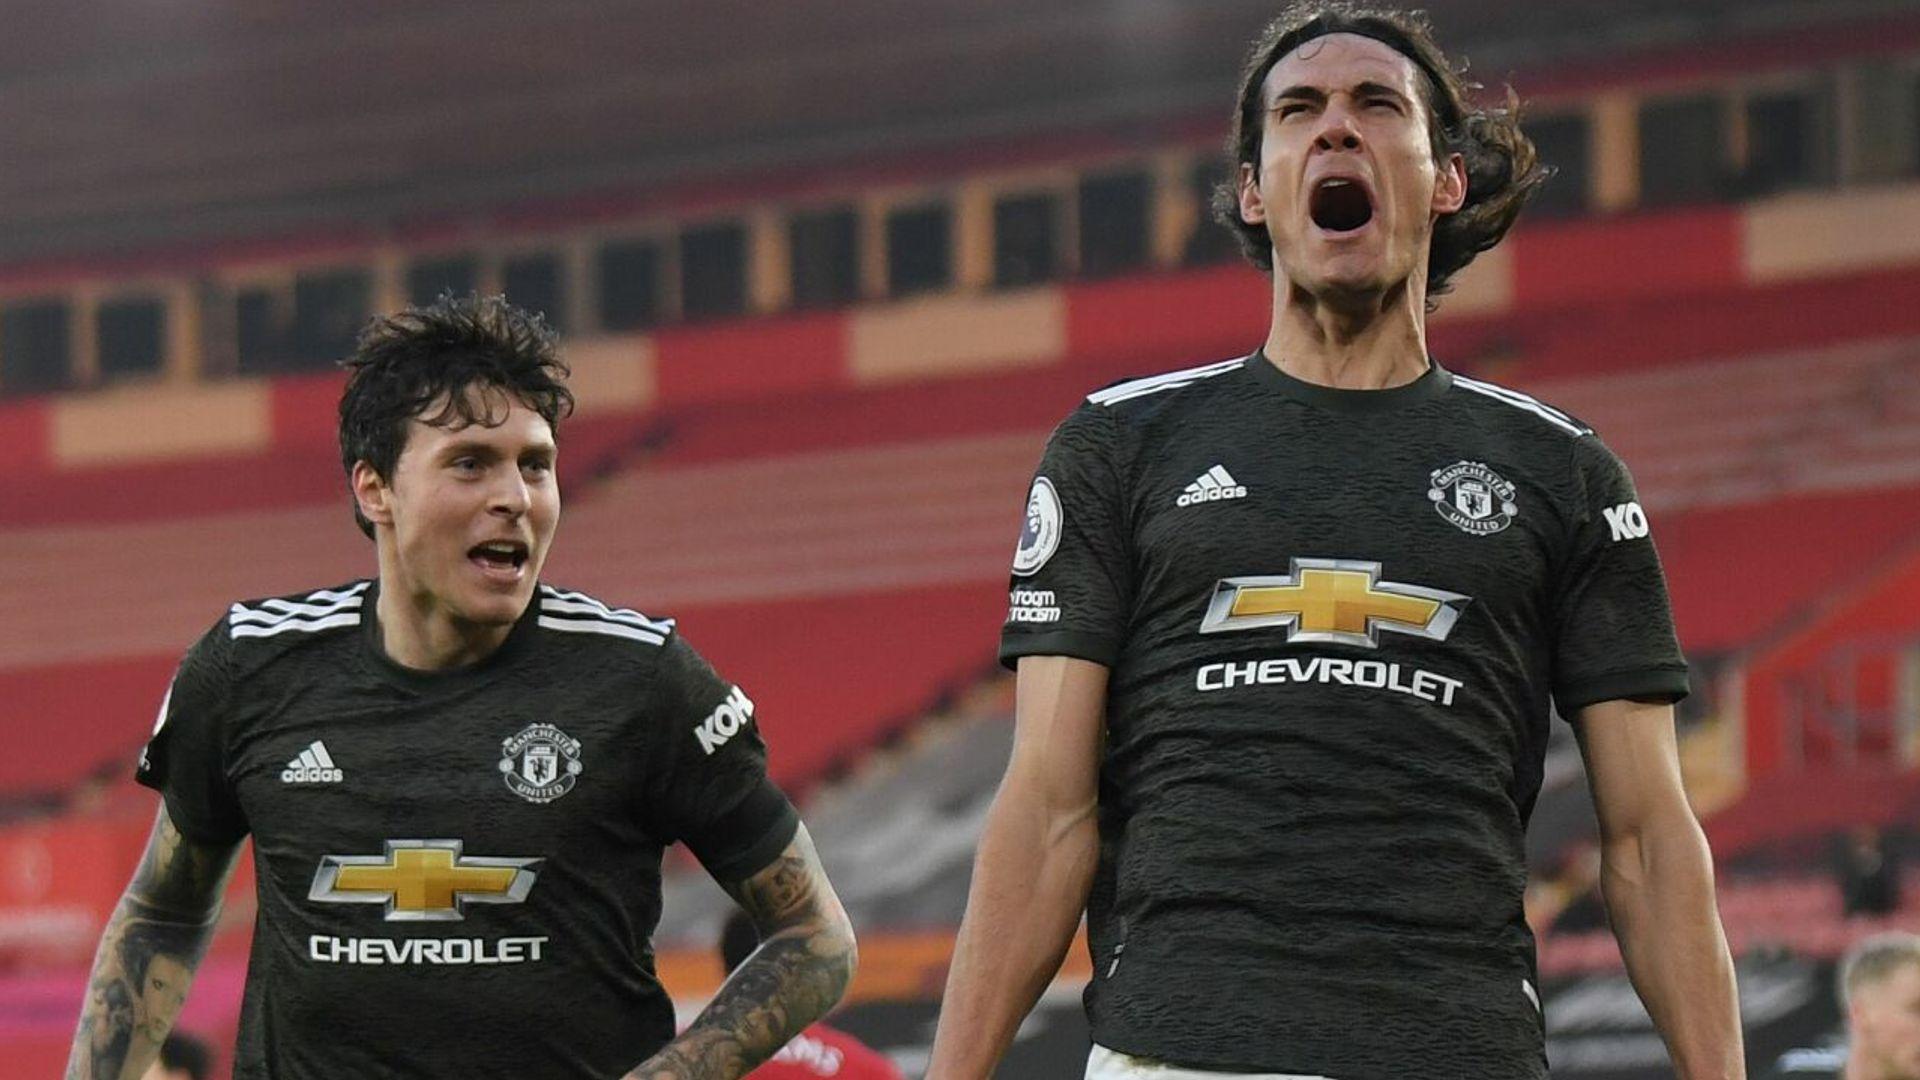 Super sub Cavani secures dramatic Man Utd comeback win